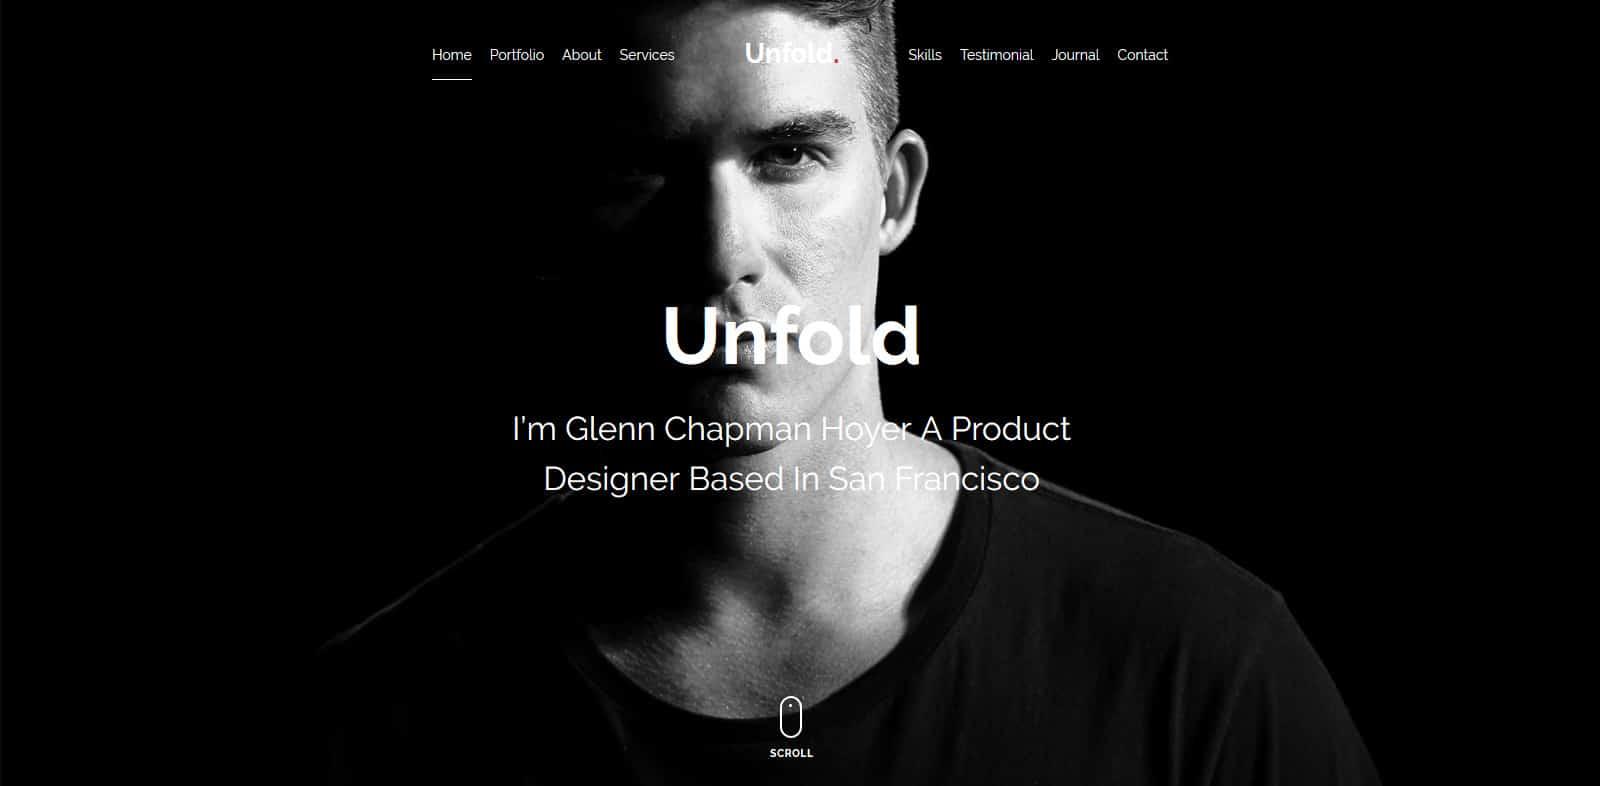 unfold-free-multipurpose-website-template